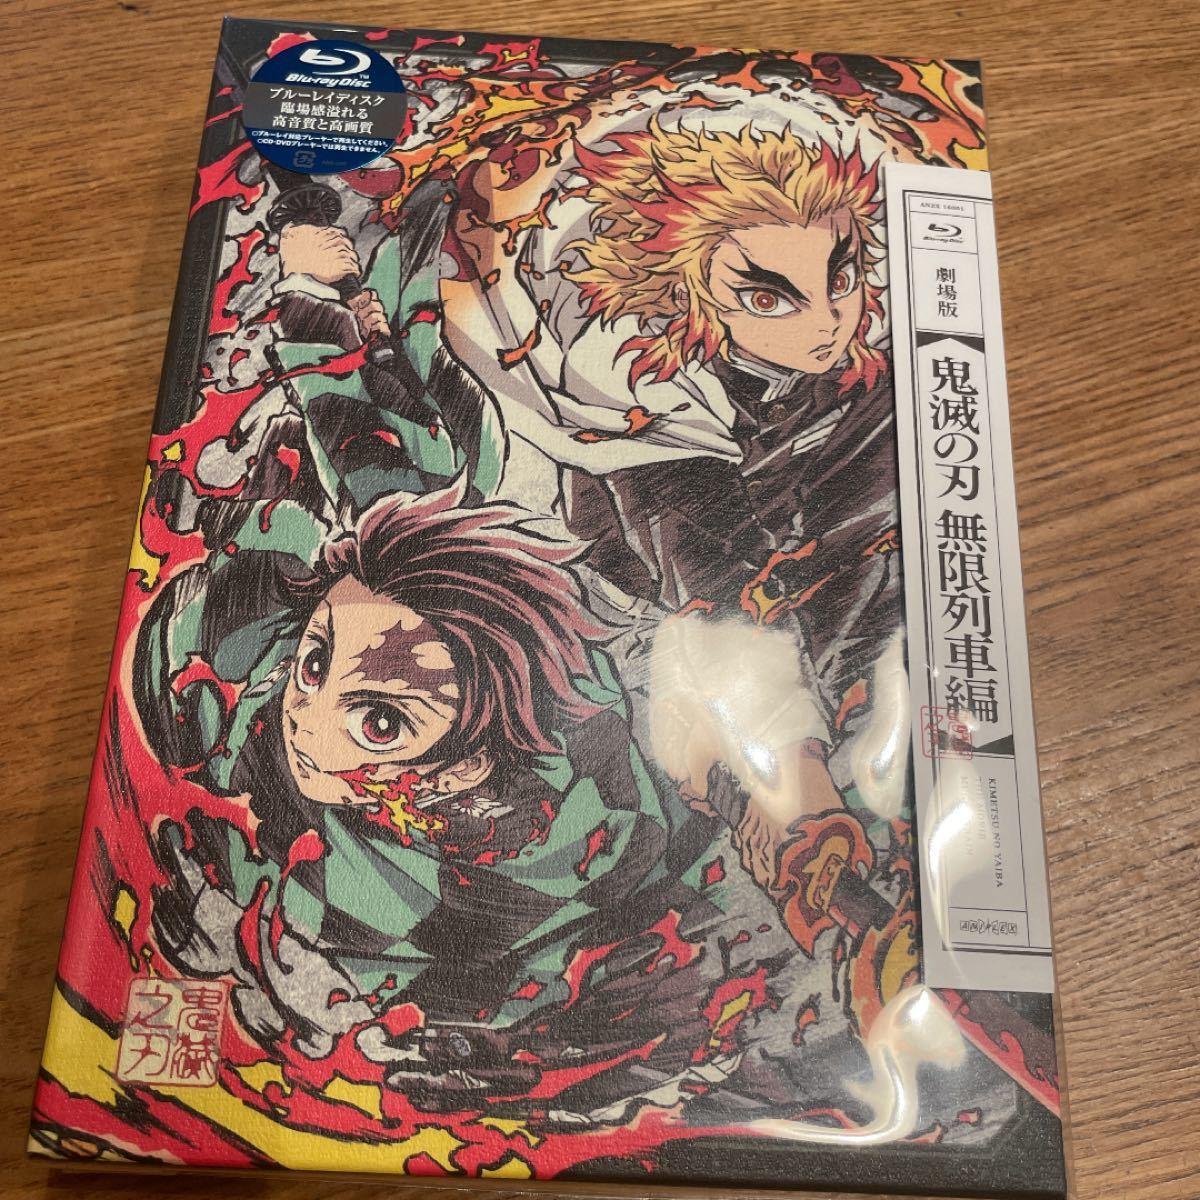 鬼滅の刃 無限列車編 Blu-ray 完全限定生産品